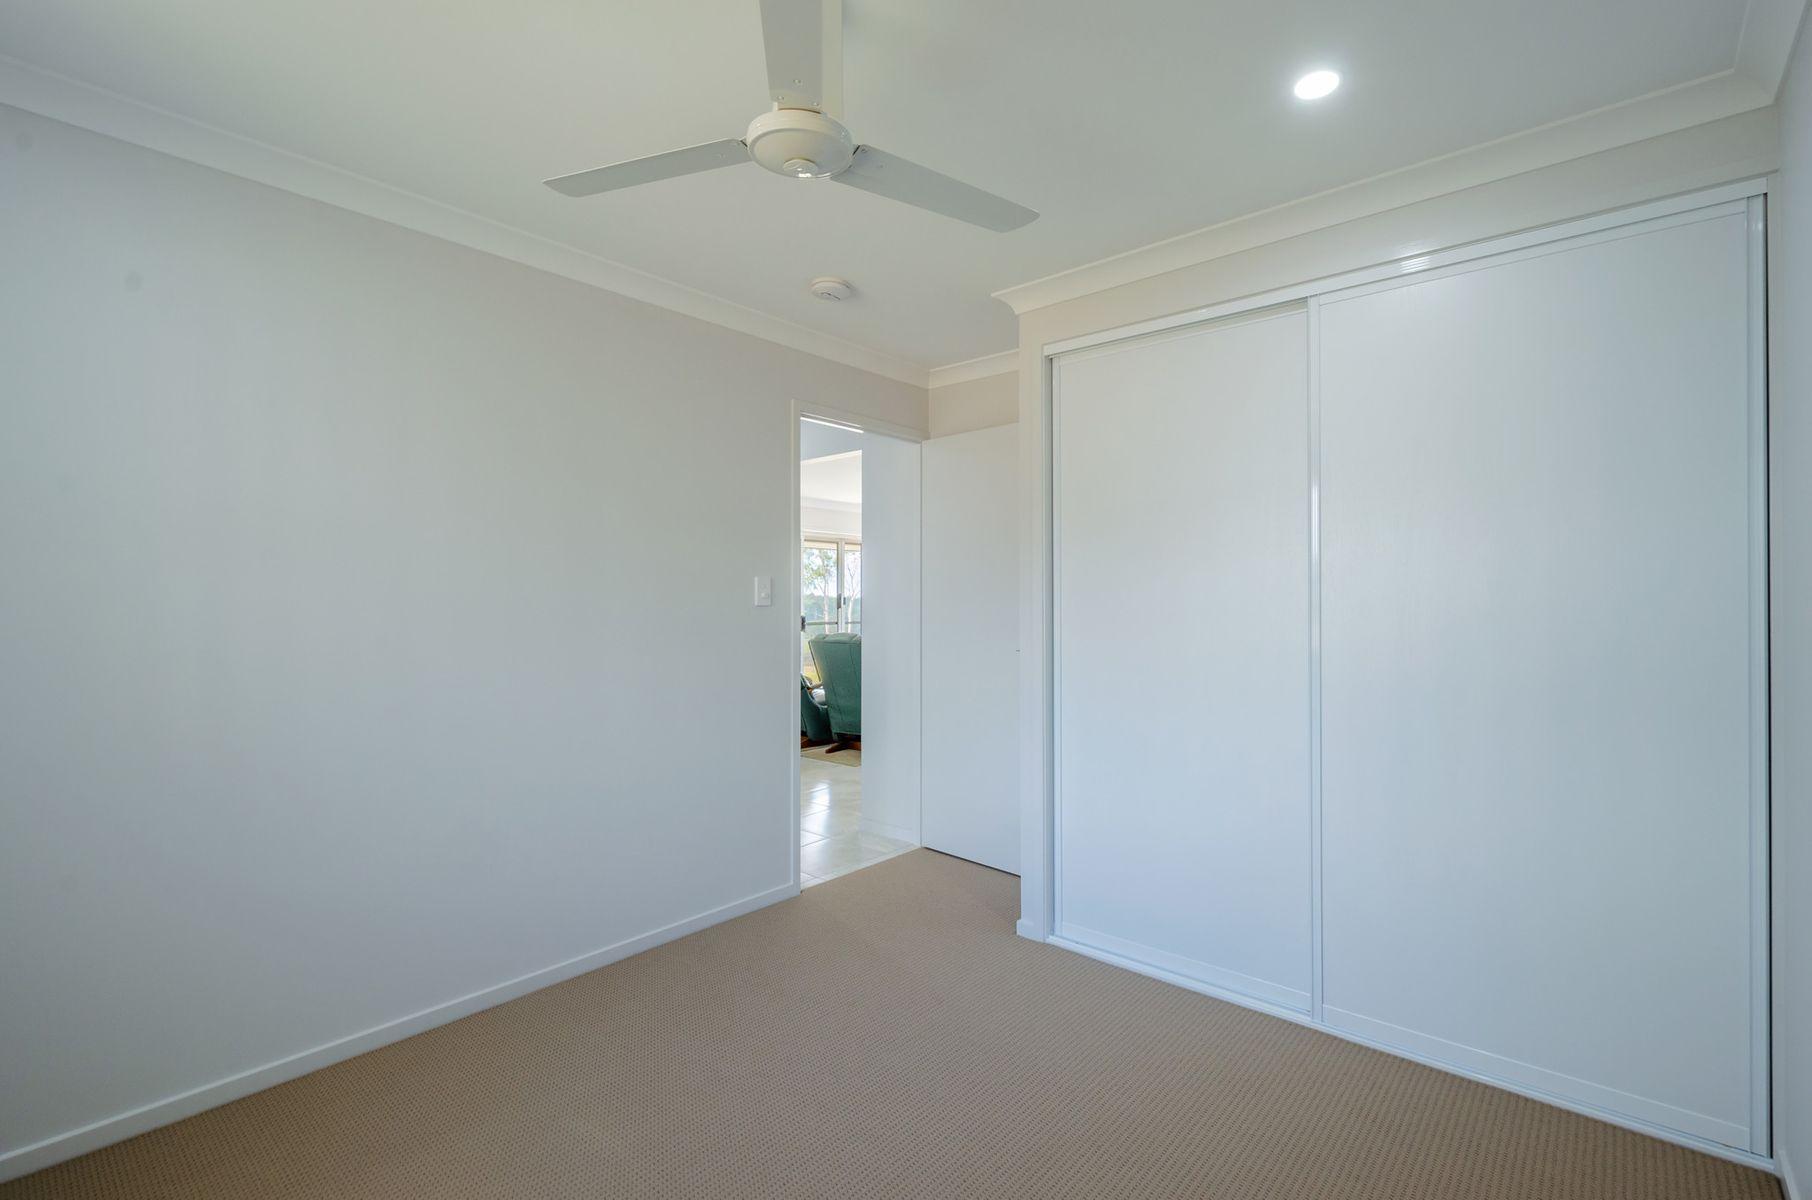 557 North Bucca Road, Bucca, QLD 4670